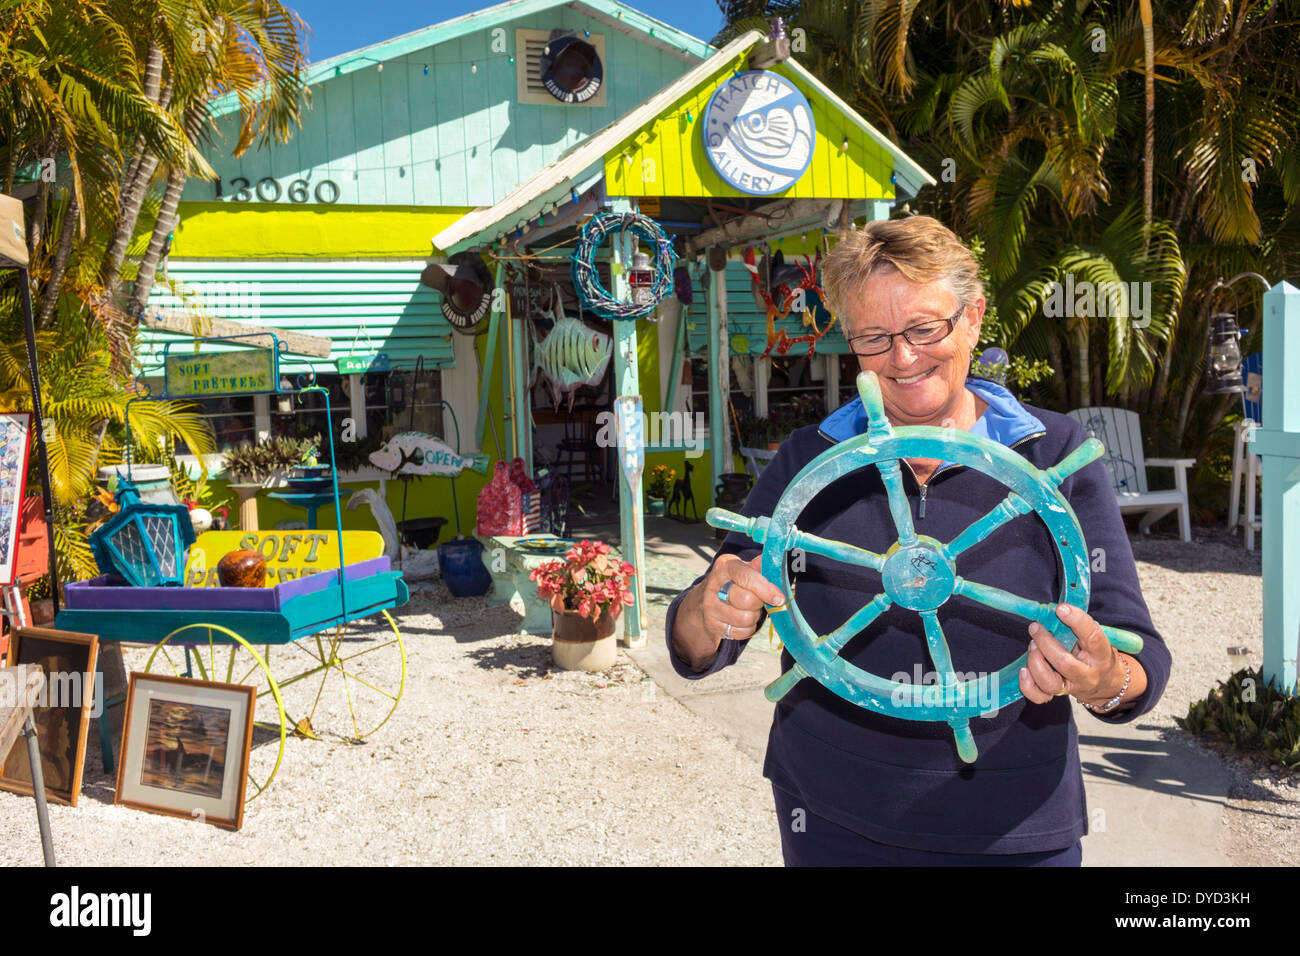 Port Charlotte Florida Harbor Placida Art Market sign Hatch Gallery shopping exterior colorful senior woman boat steering wheel - Stock Image